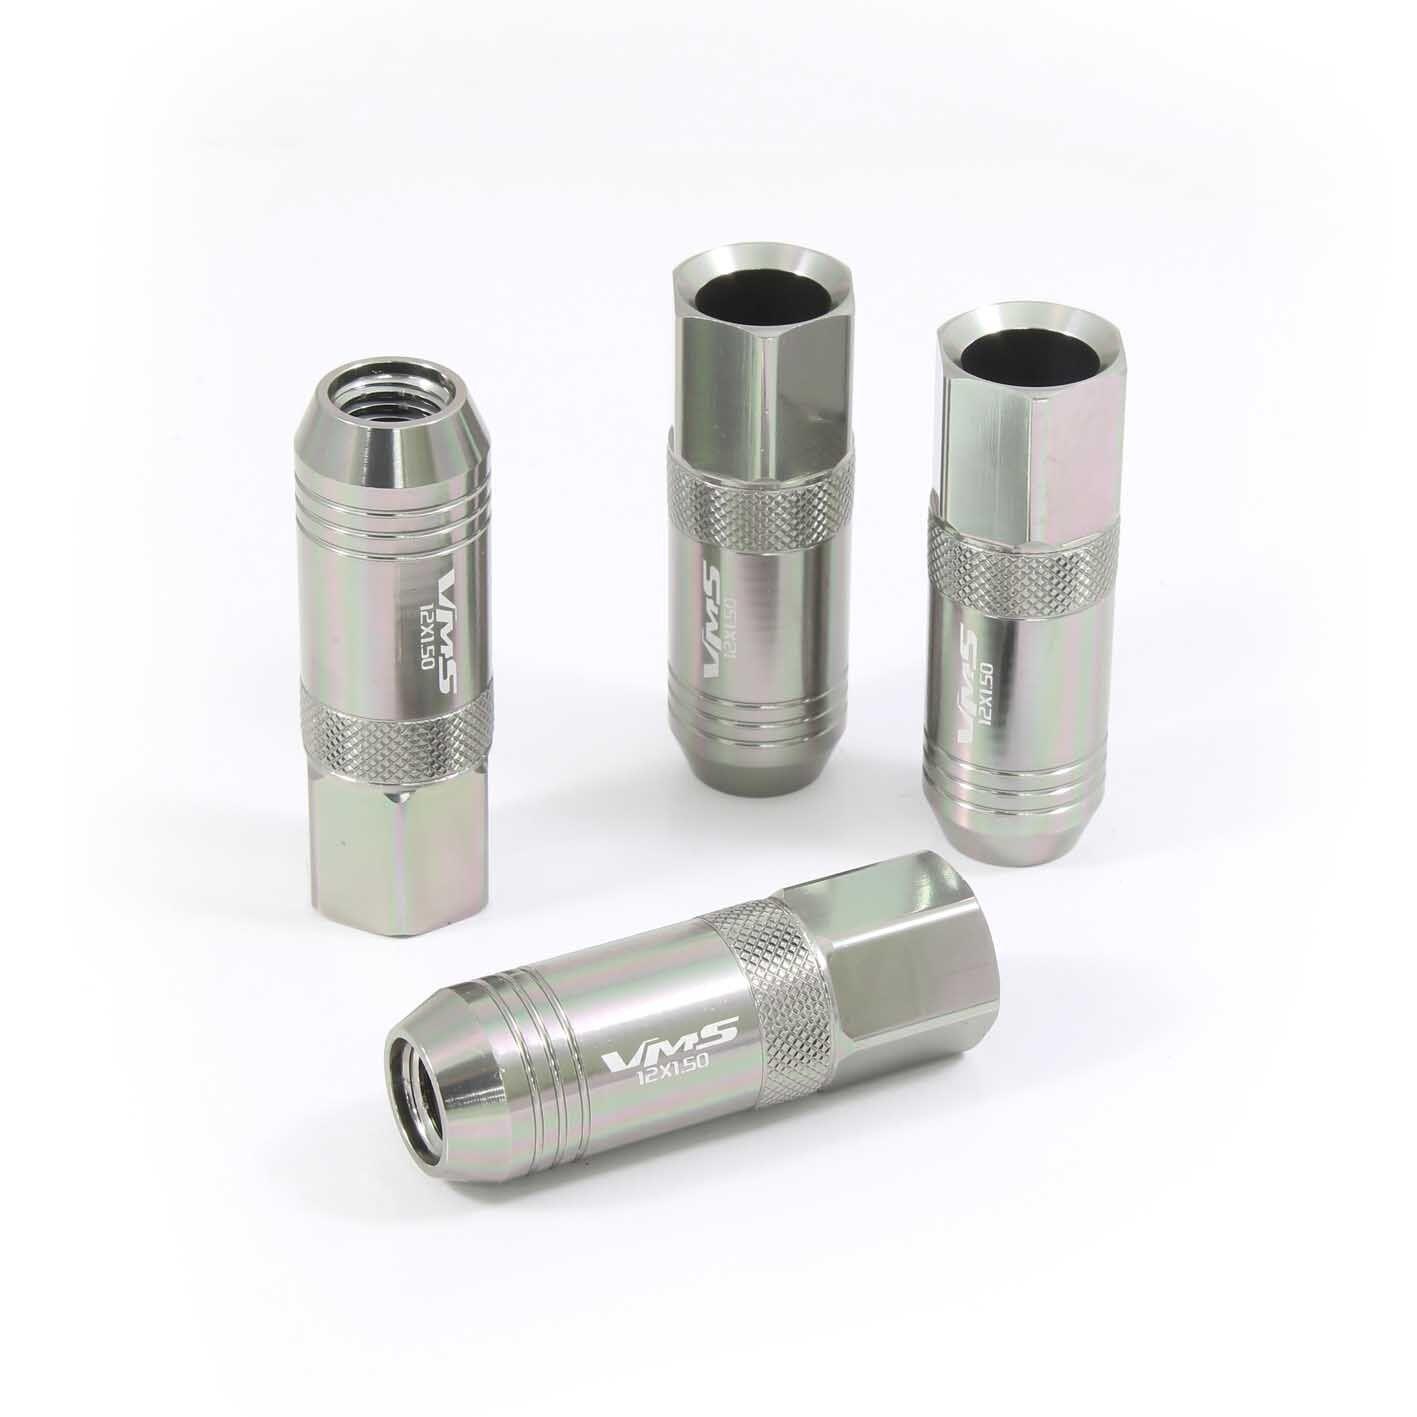 vms 20 gun metal 60mm aluminum extended tuner lug nuts lugs for wheels 12x1 5